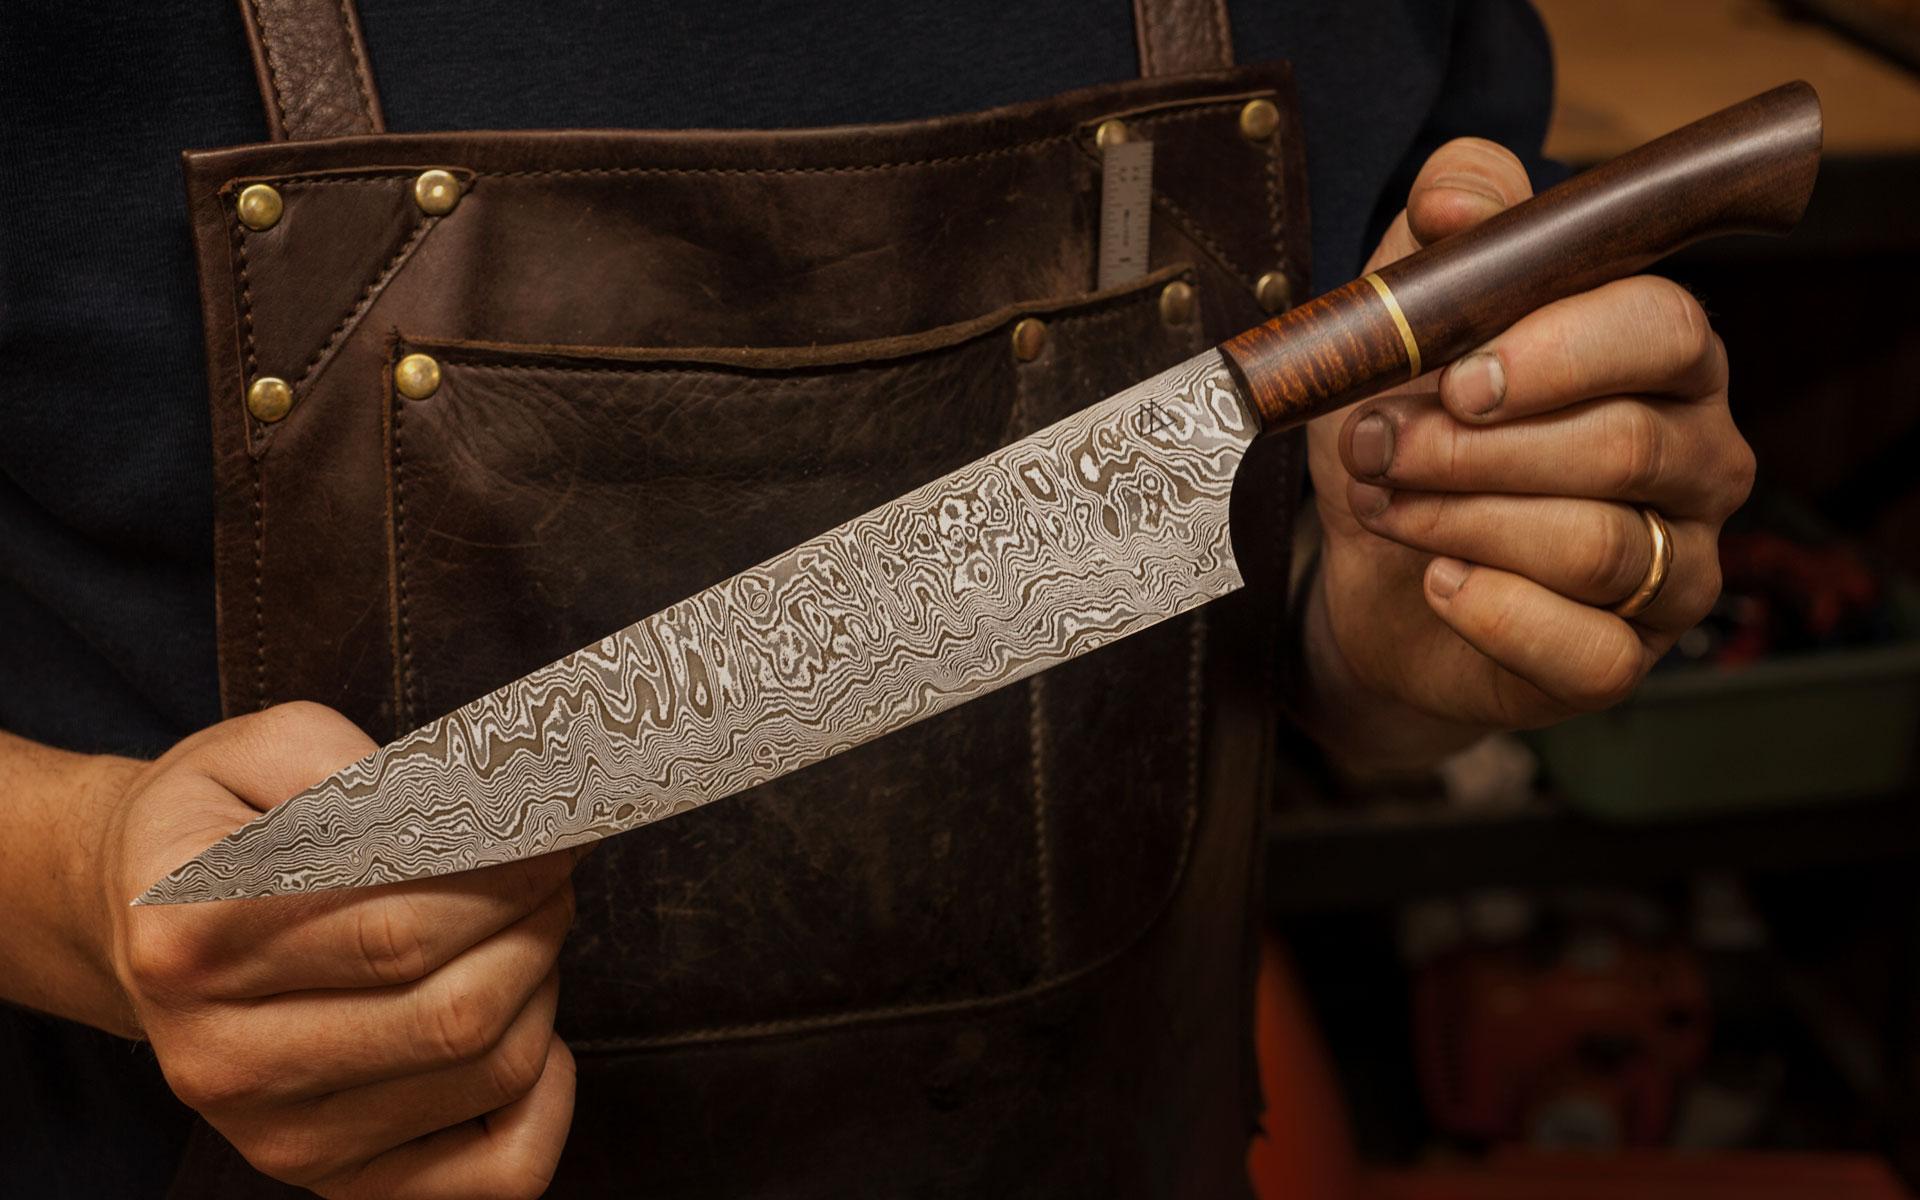 Mathieu holding knife wearing brown apron.